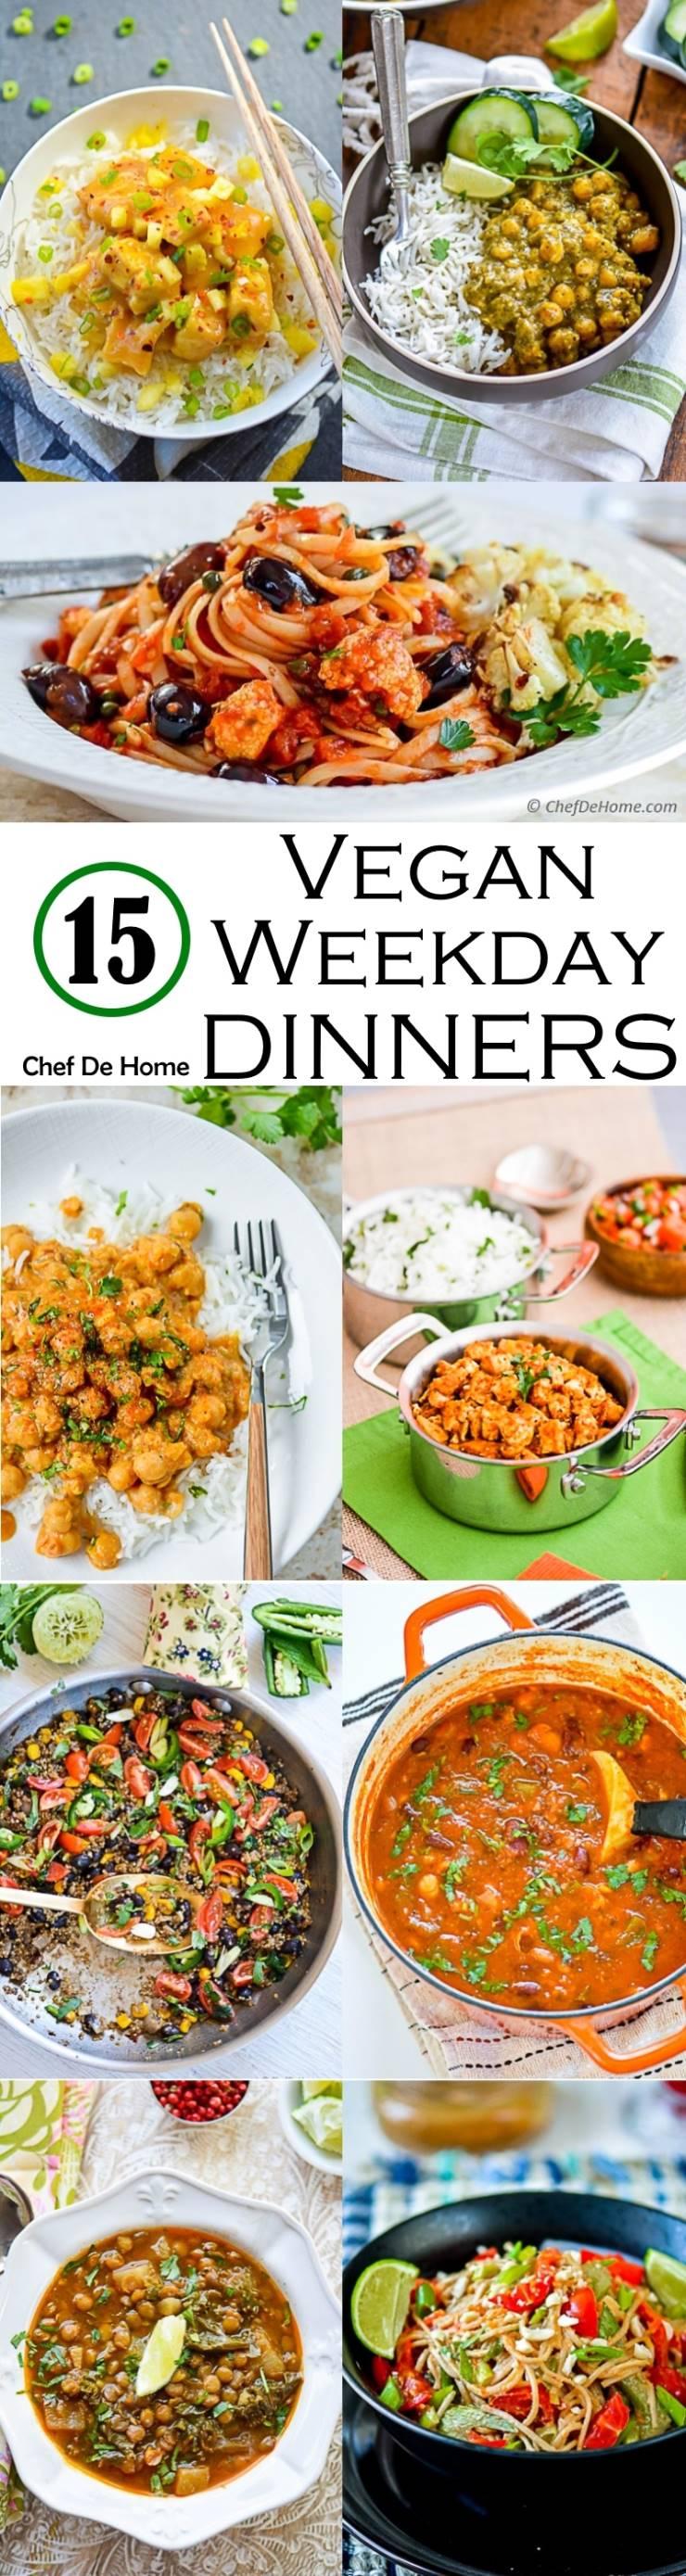 15 Easy Vegan Dinners Ideas for Weekdays